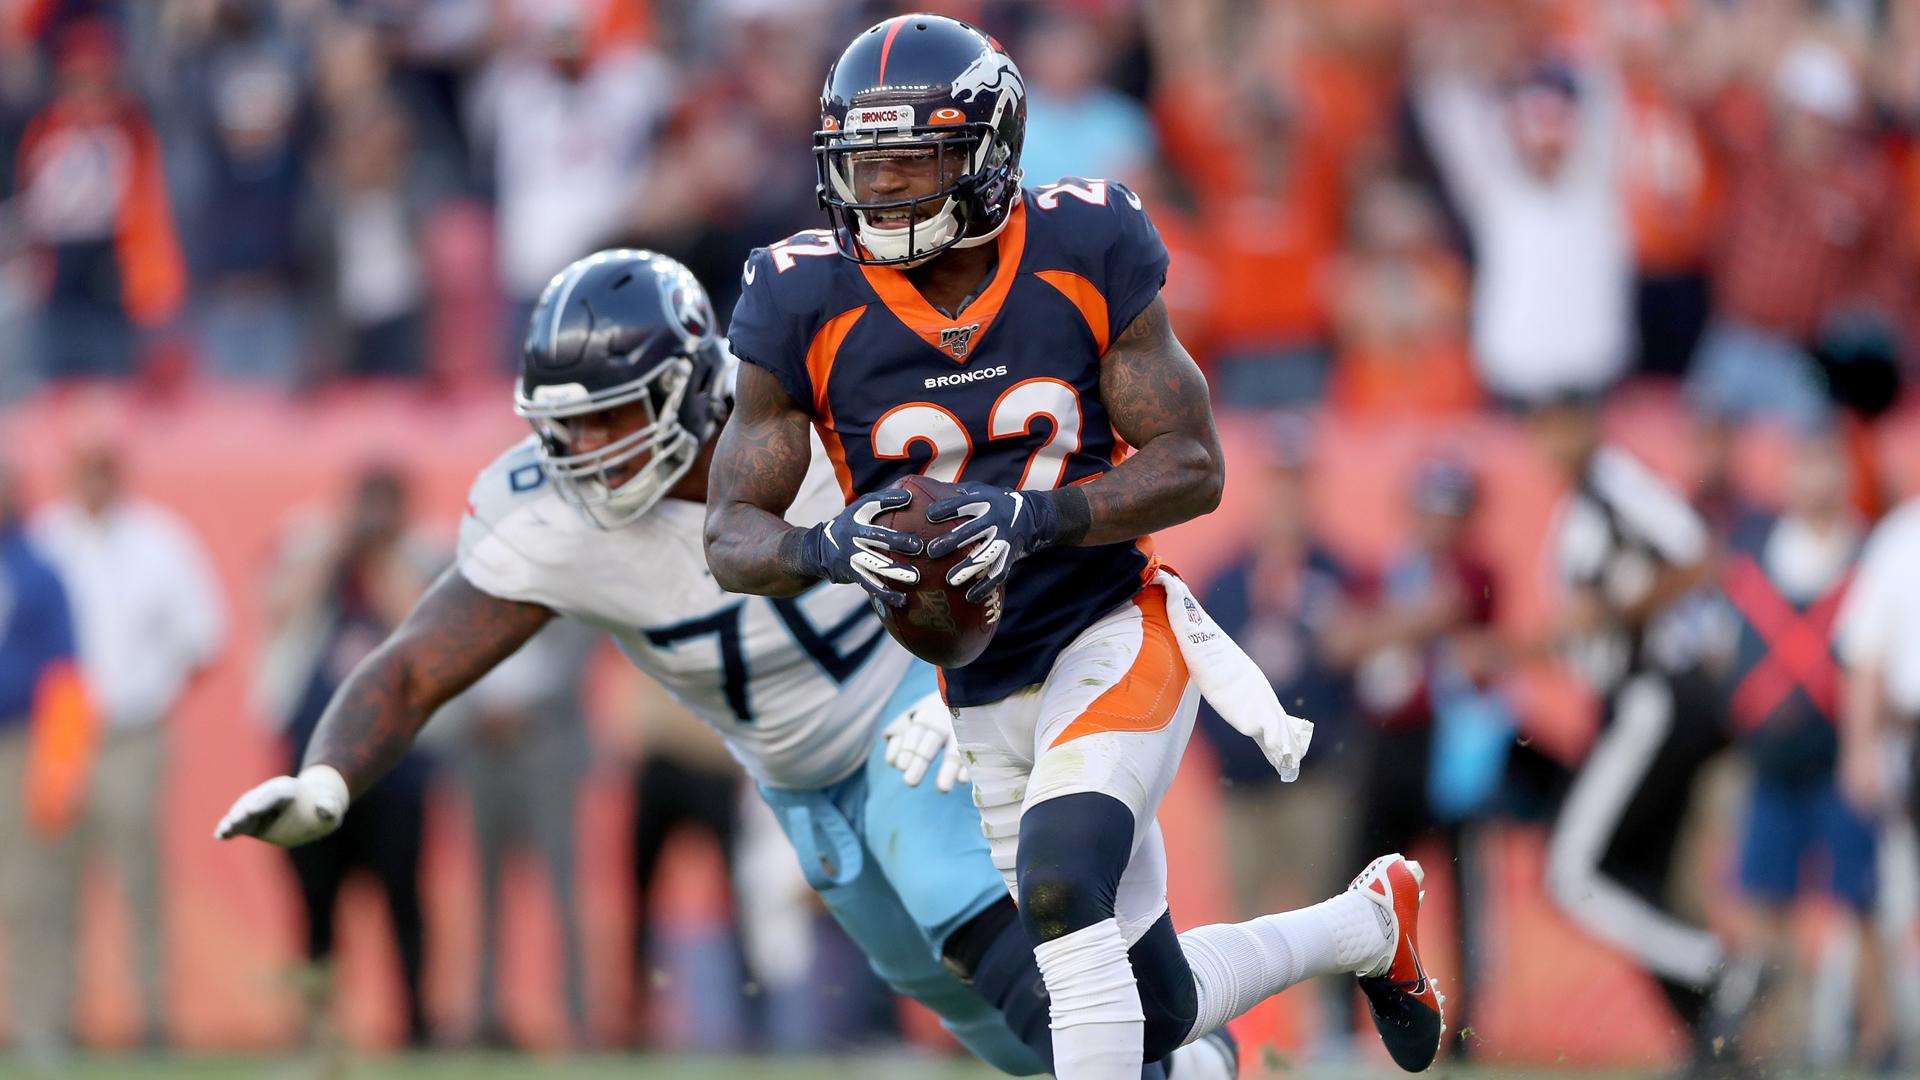 Broncos' Kareem Jackson tests positive for COVID-19